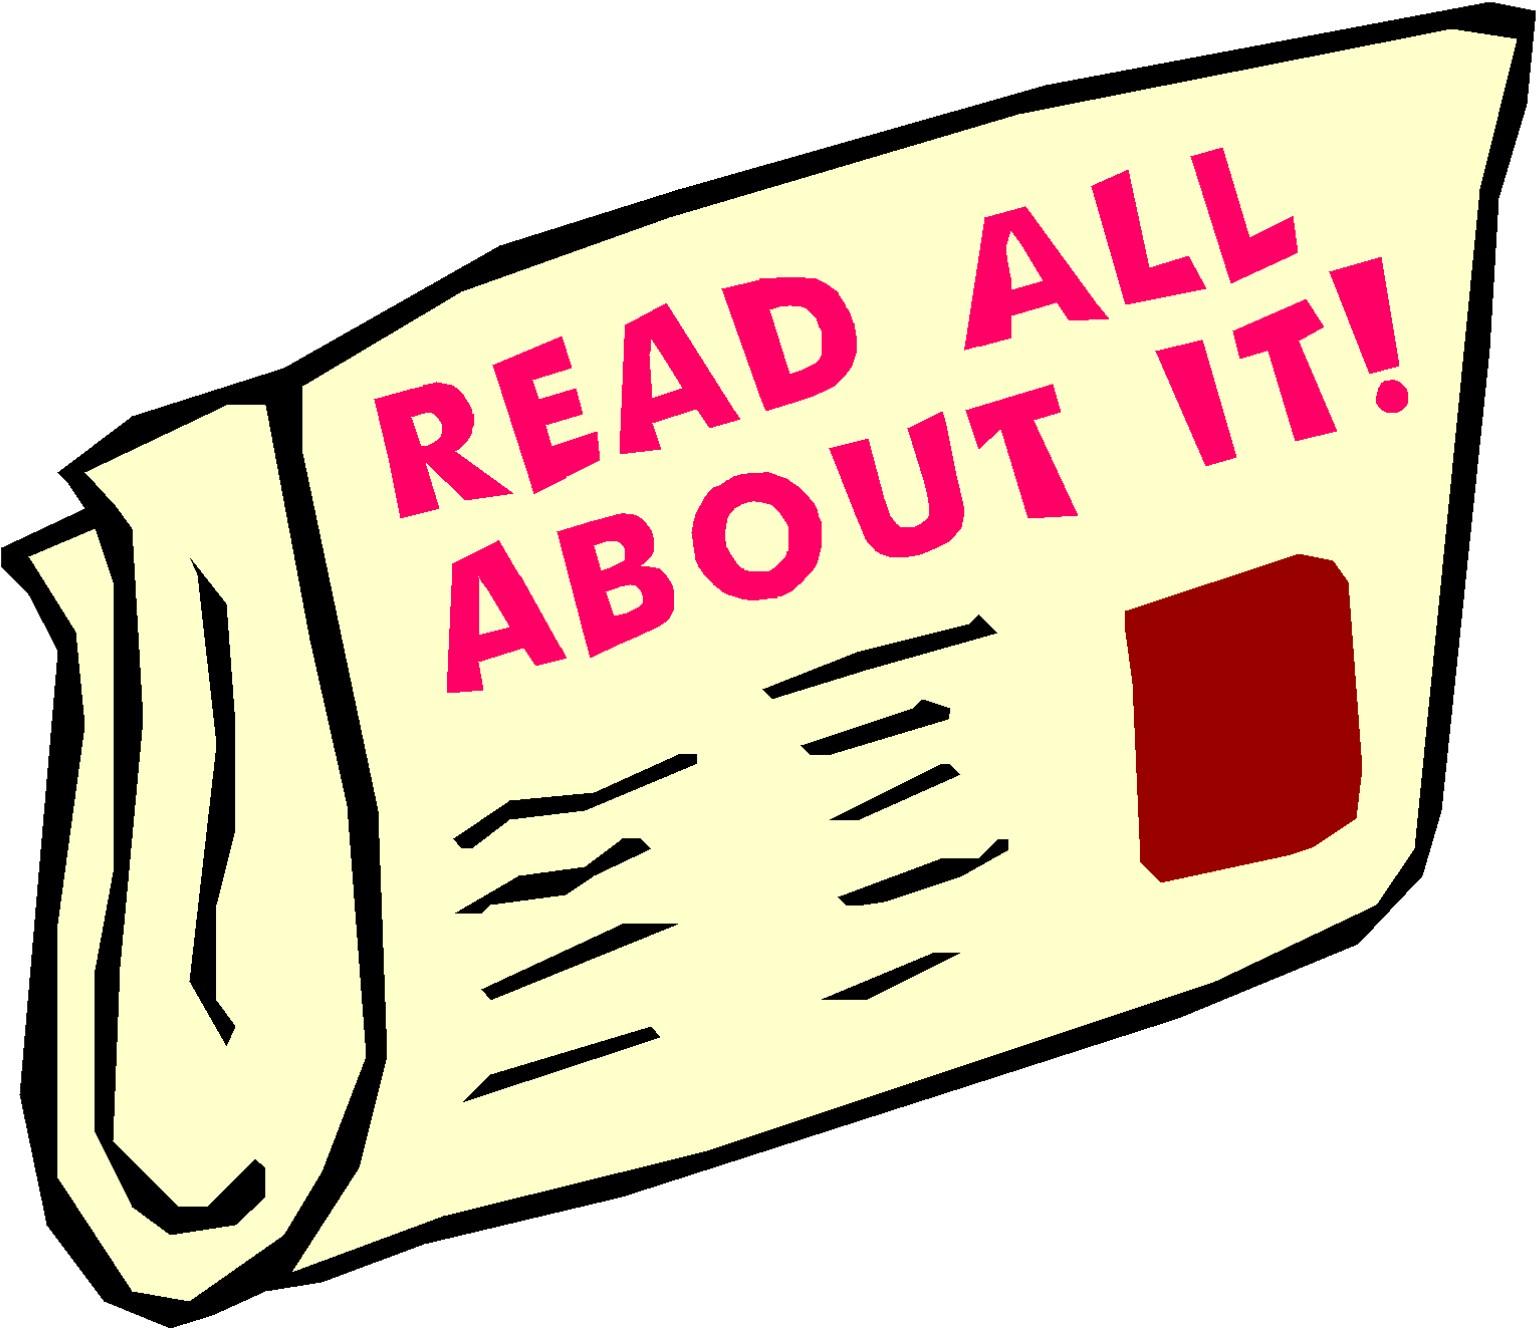 monthly newsletter tayler clip art - Kindergarten News Clipart